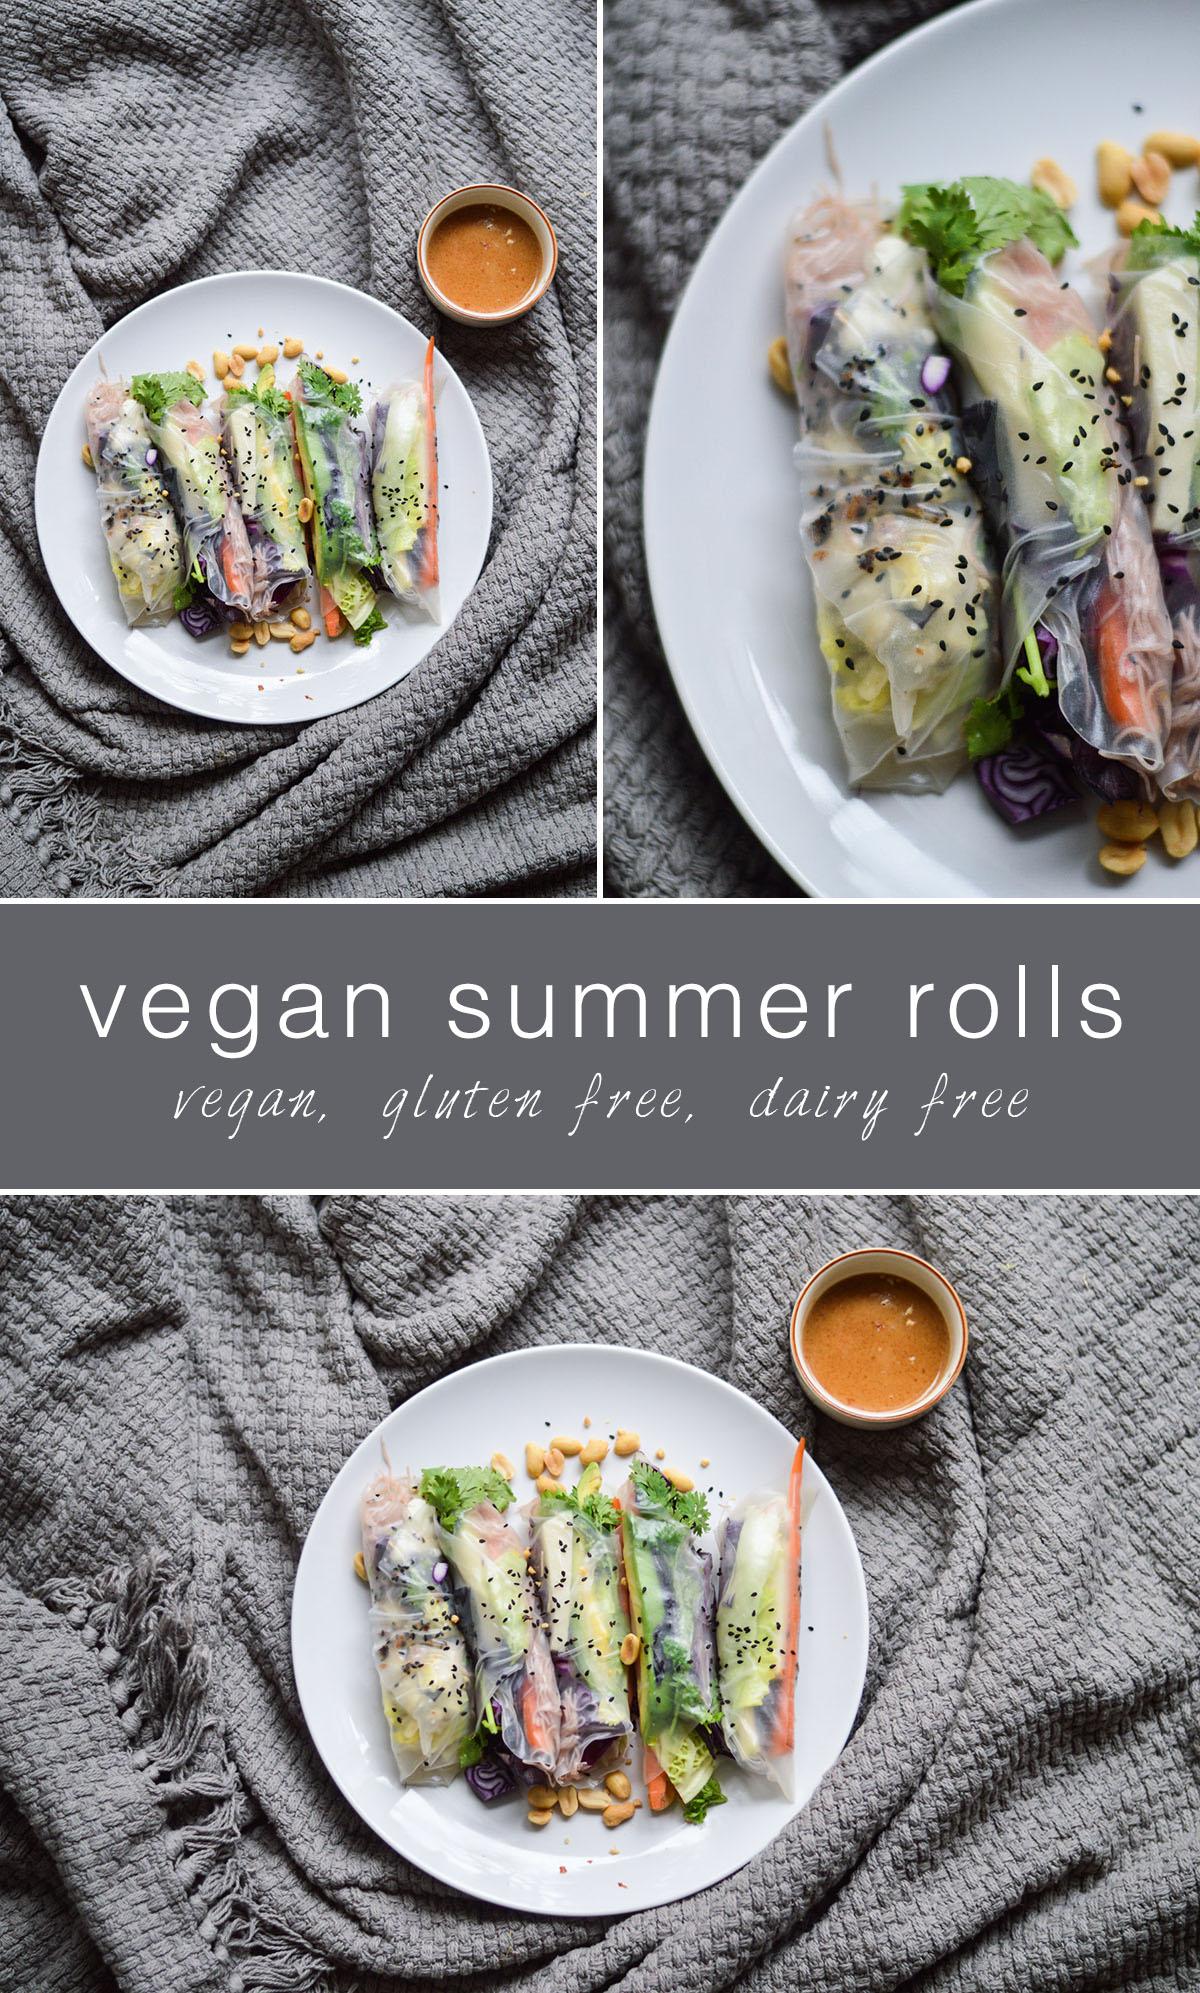 Vegan summer rolls with peanutbutter dip. Vegan, gluten free, dairy free.